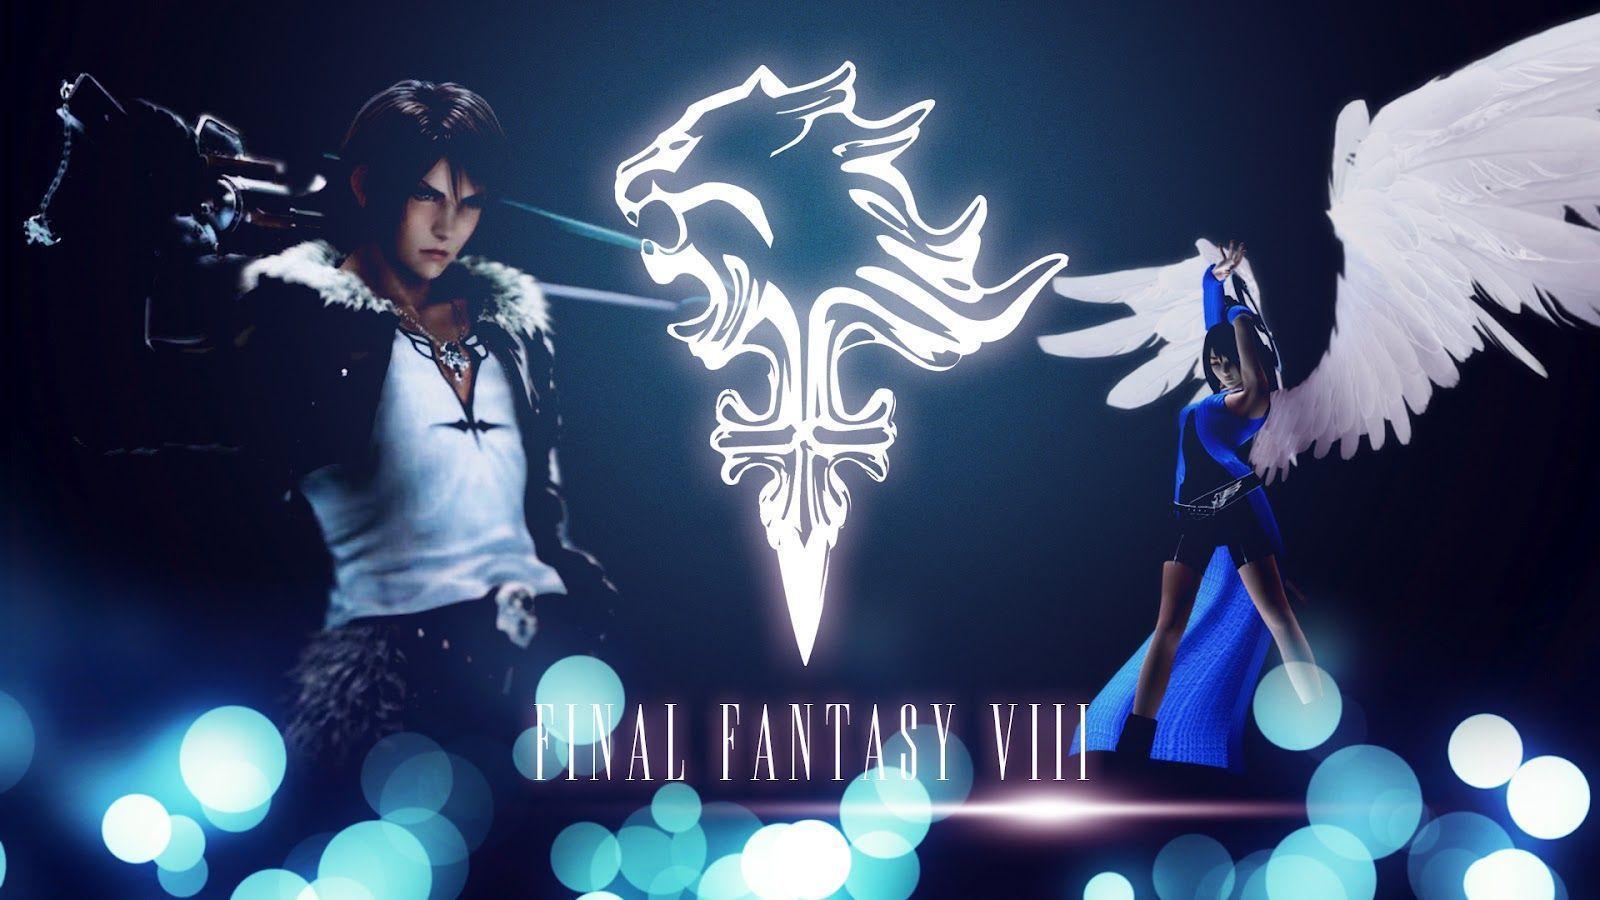 488 final fantasy hd - photo #21